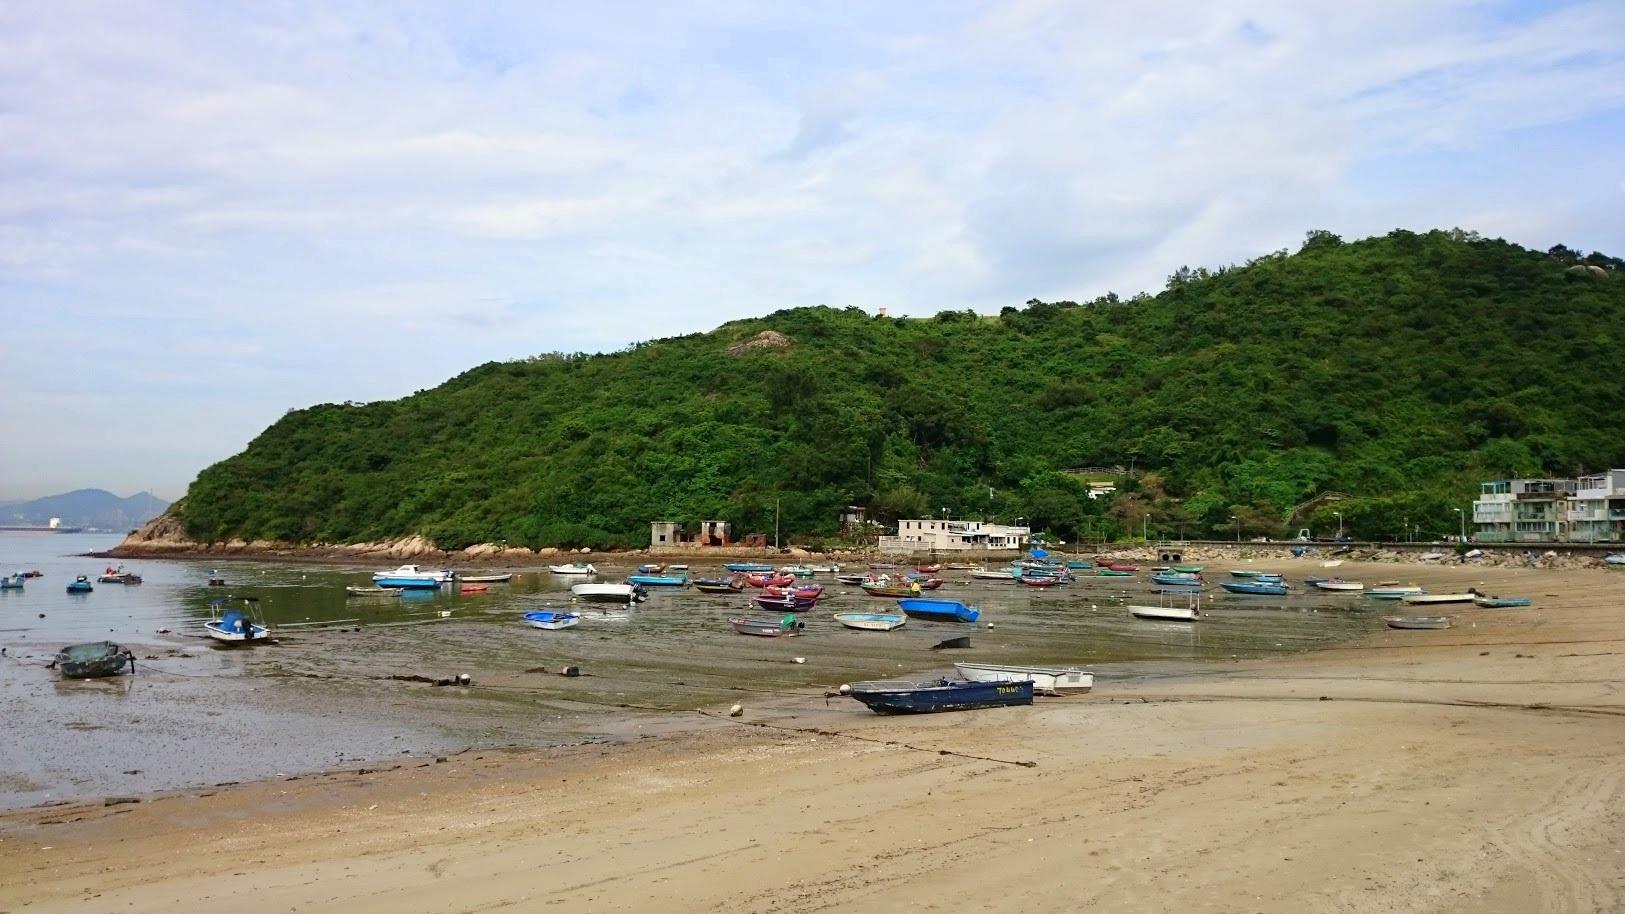 Peng Chau hongkong saari nähtävyydet